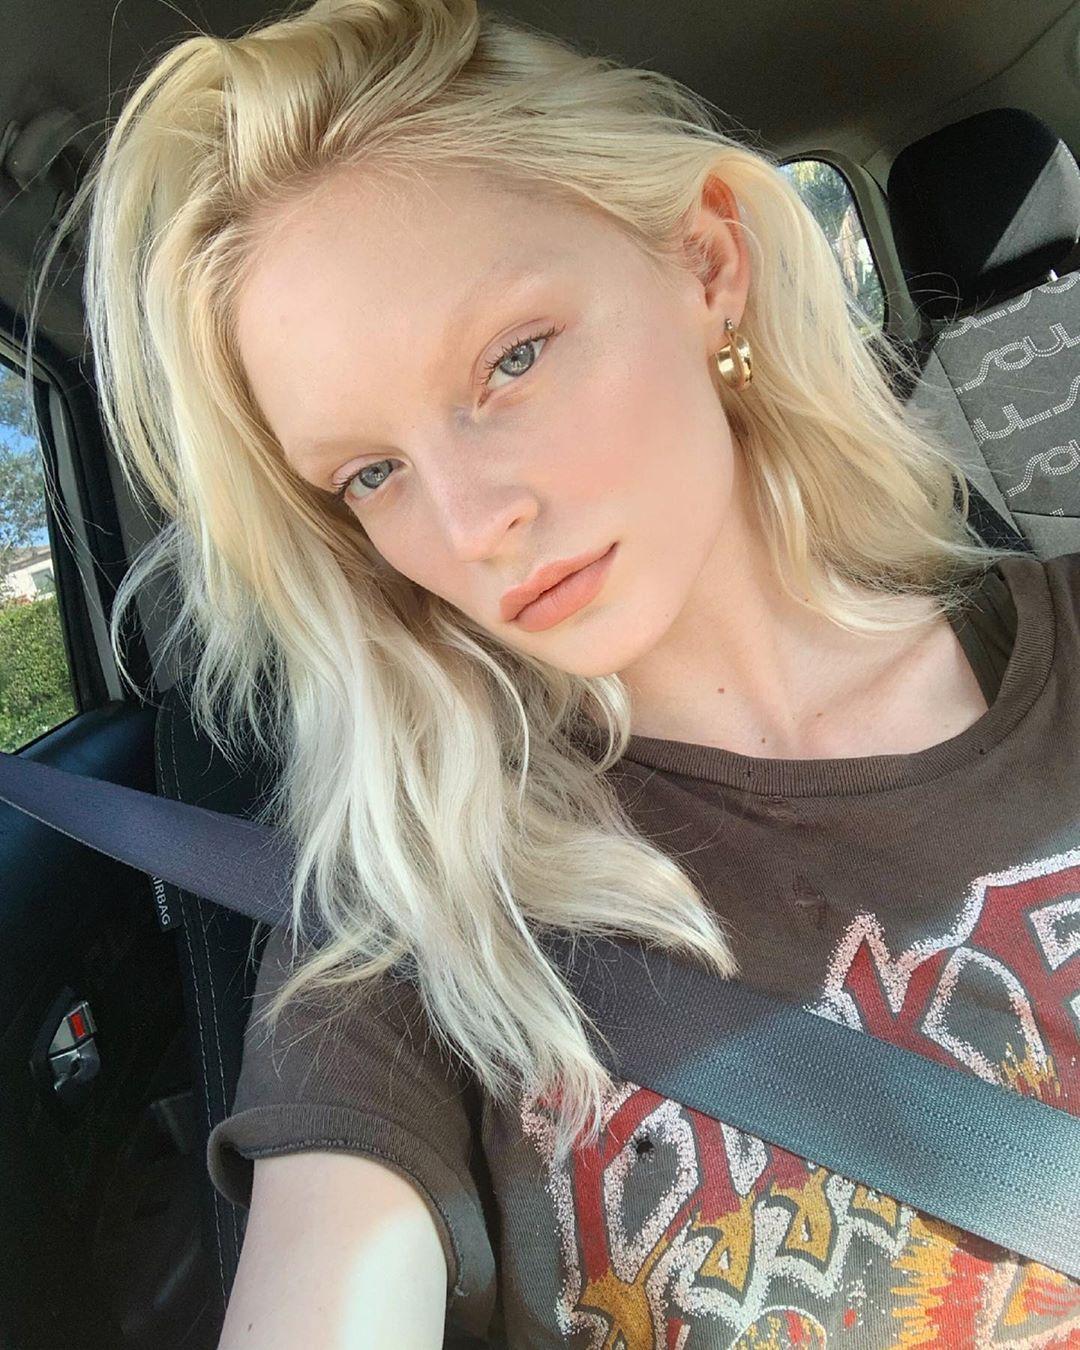 Madison Tabeek On Instagram Felt The Lighting In This Kia Kia Instagram Madison